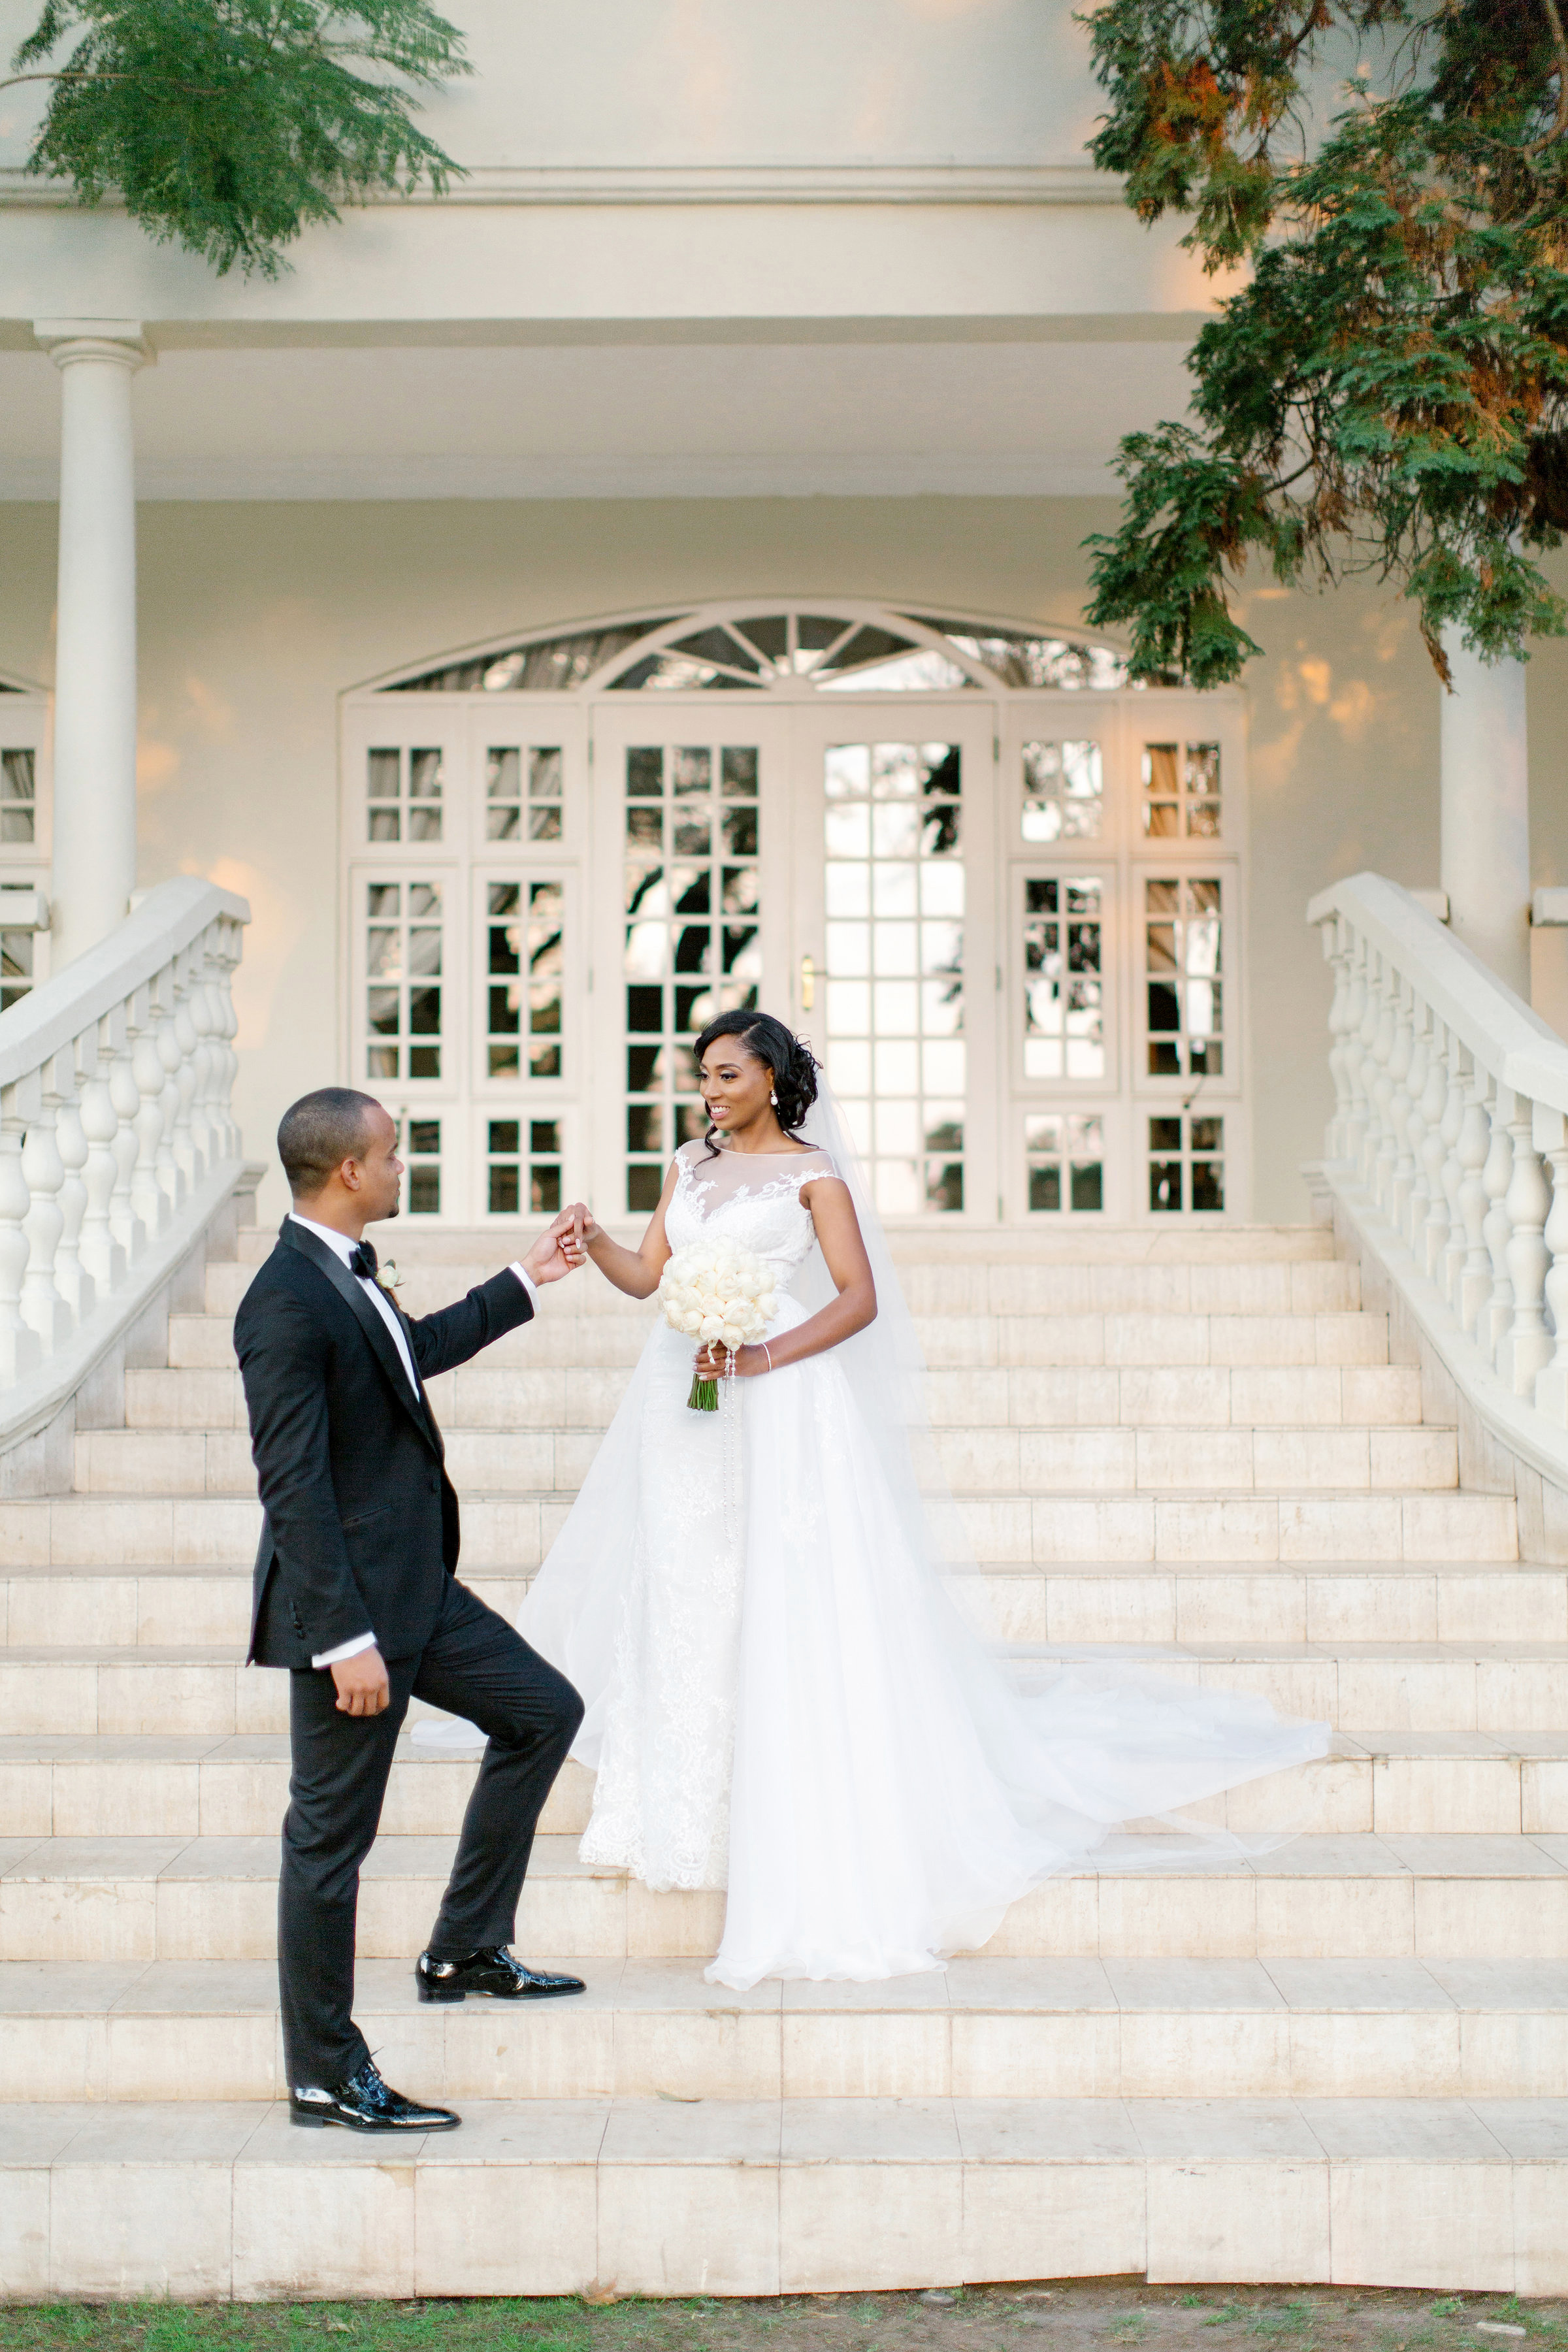 chloe shayo south africa wedding couple portrait steps